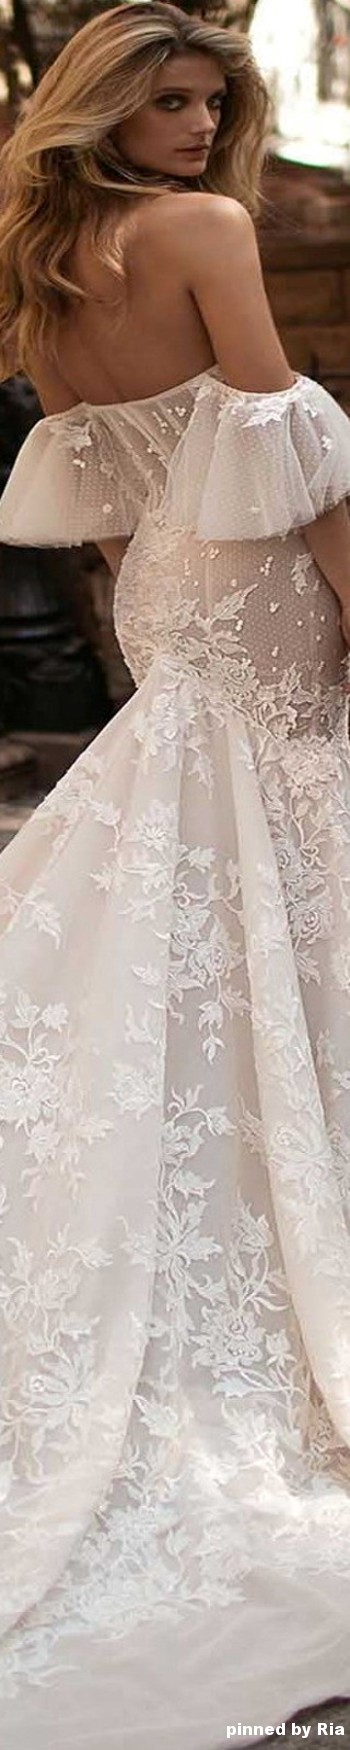 Berta Bridal Fall Winter 2017 l Ria   Wedding dresses ...